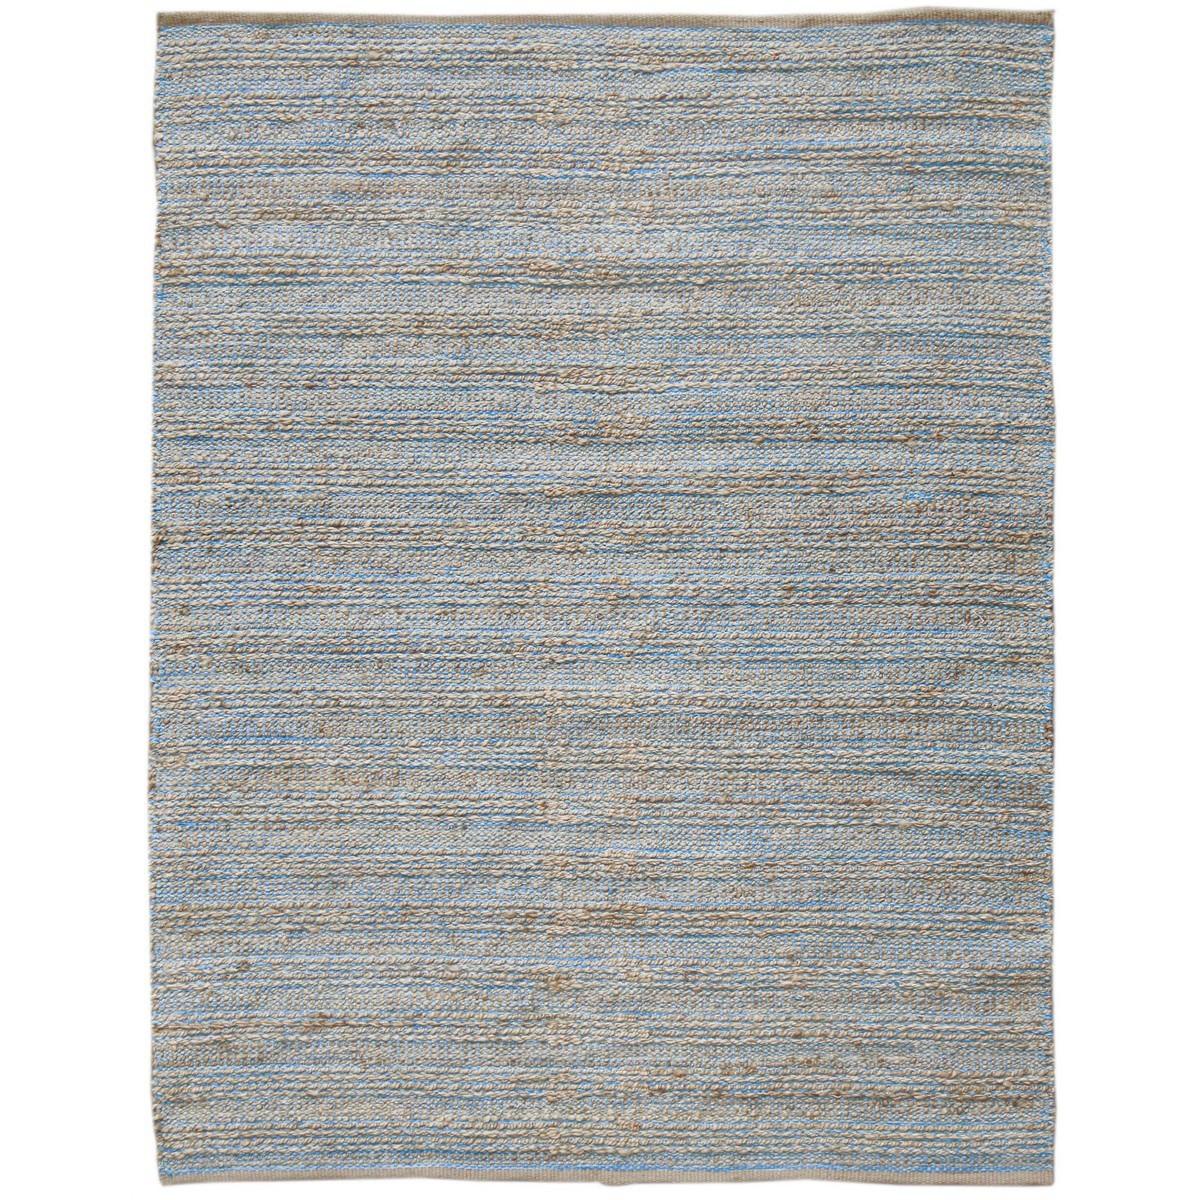 Natural Charm Handwoven Jute Rug , 190x280cm, Blue